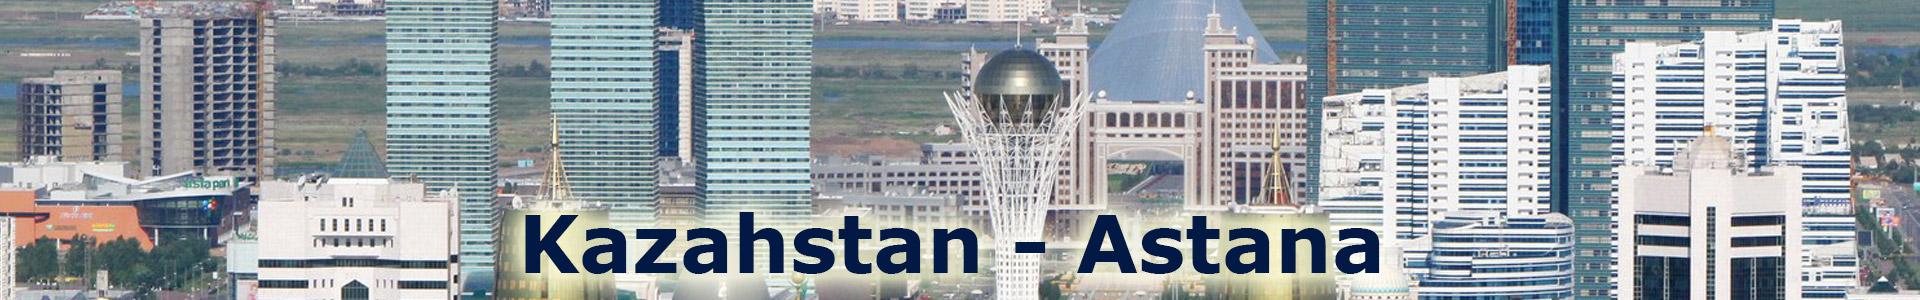 Kazahstan—Astana